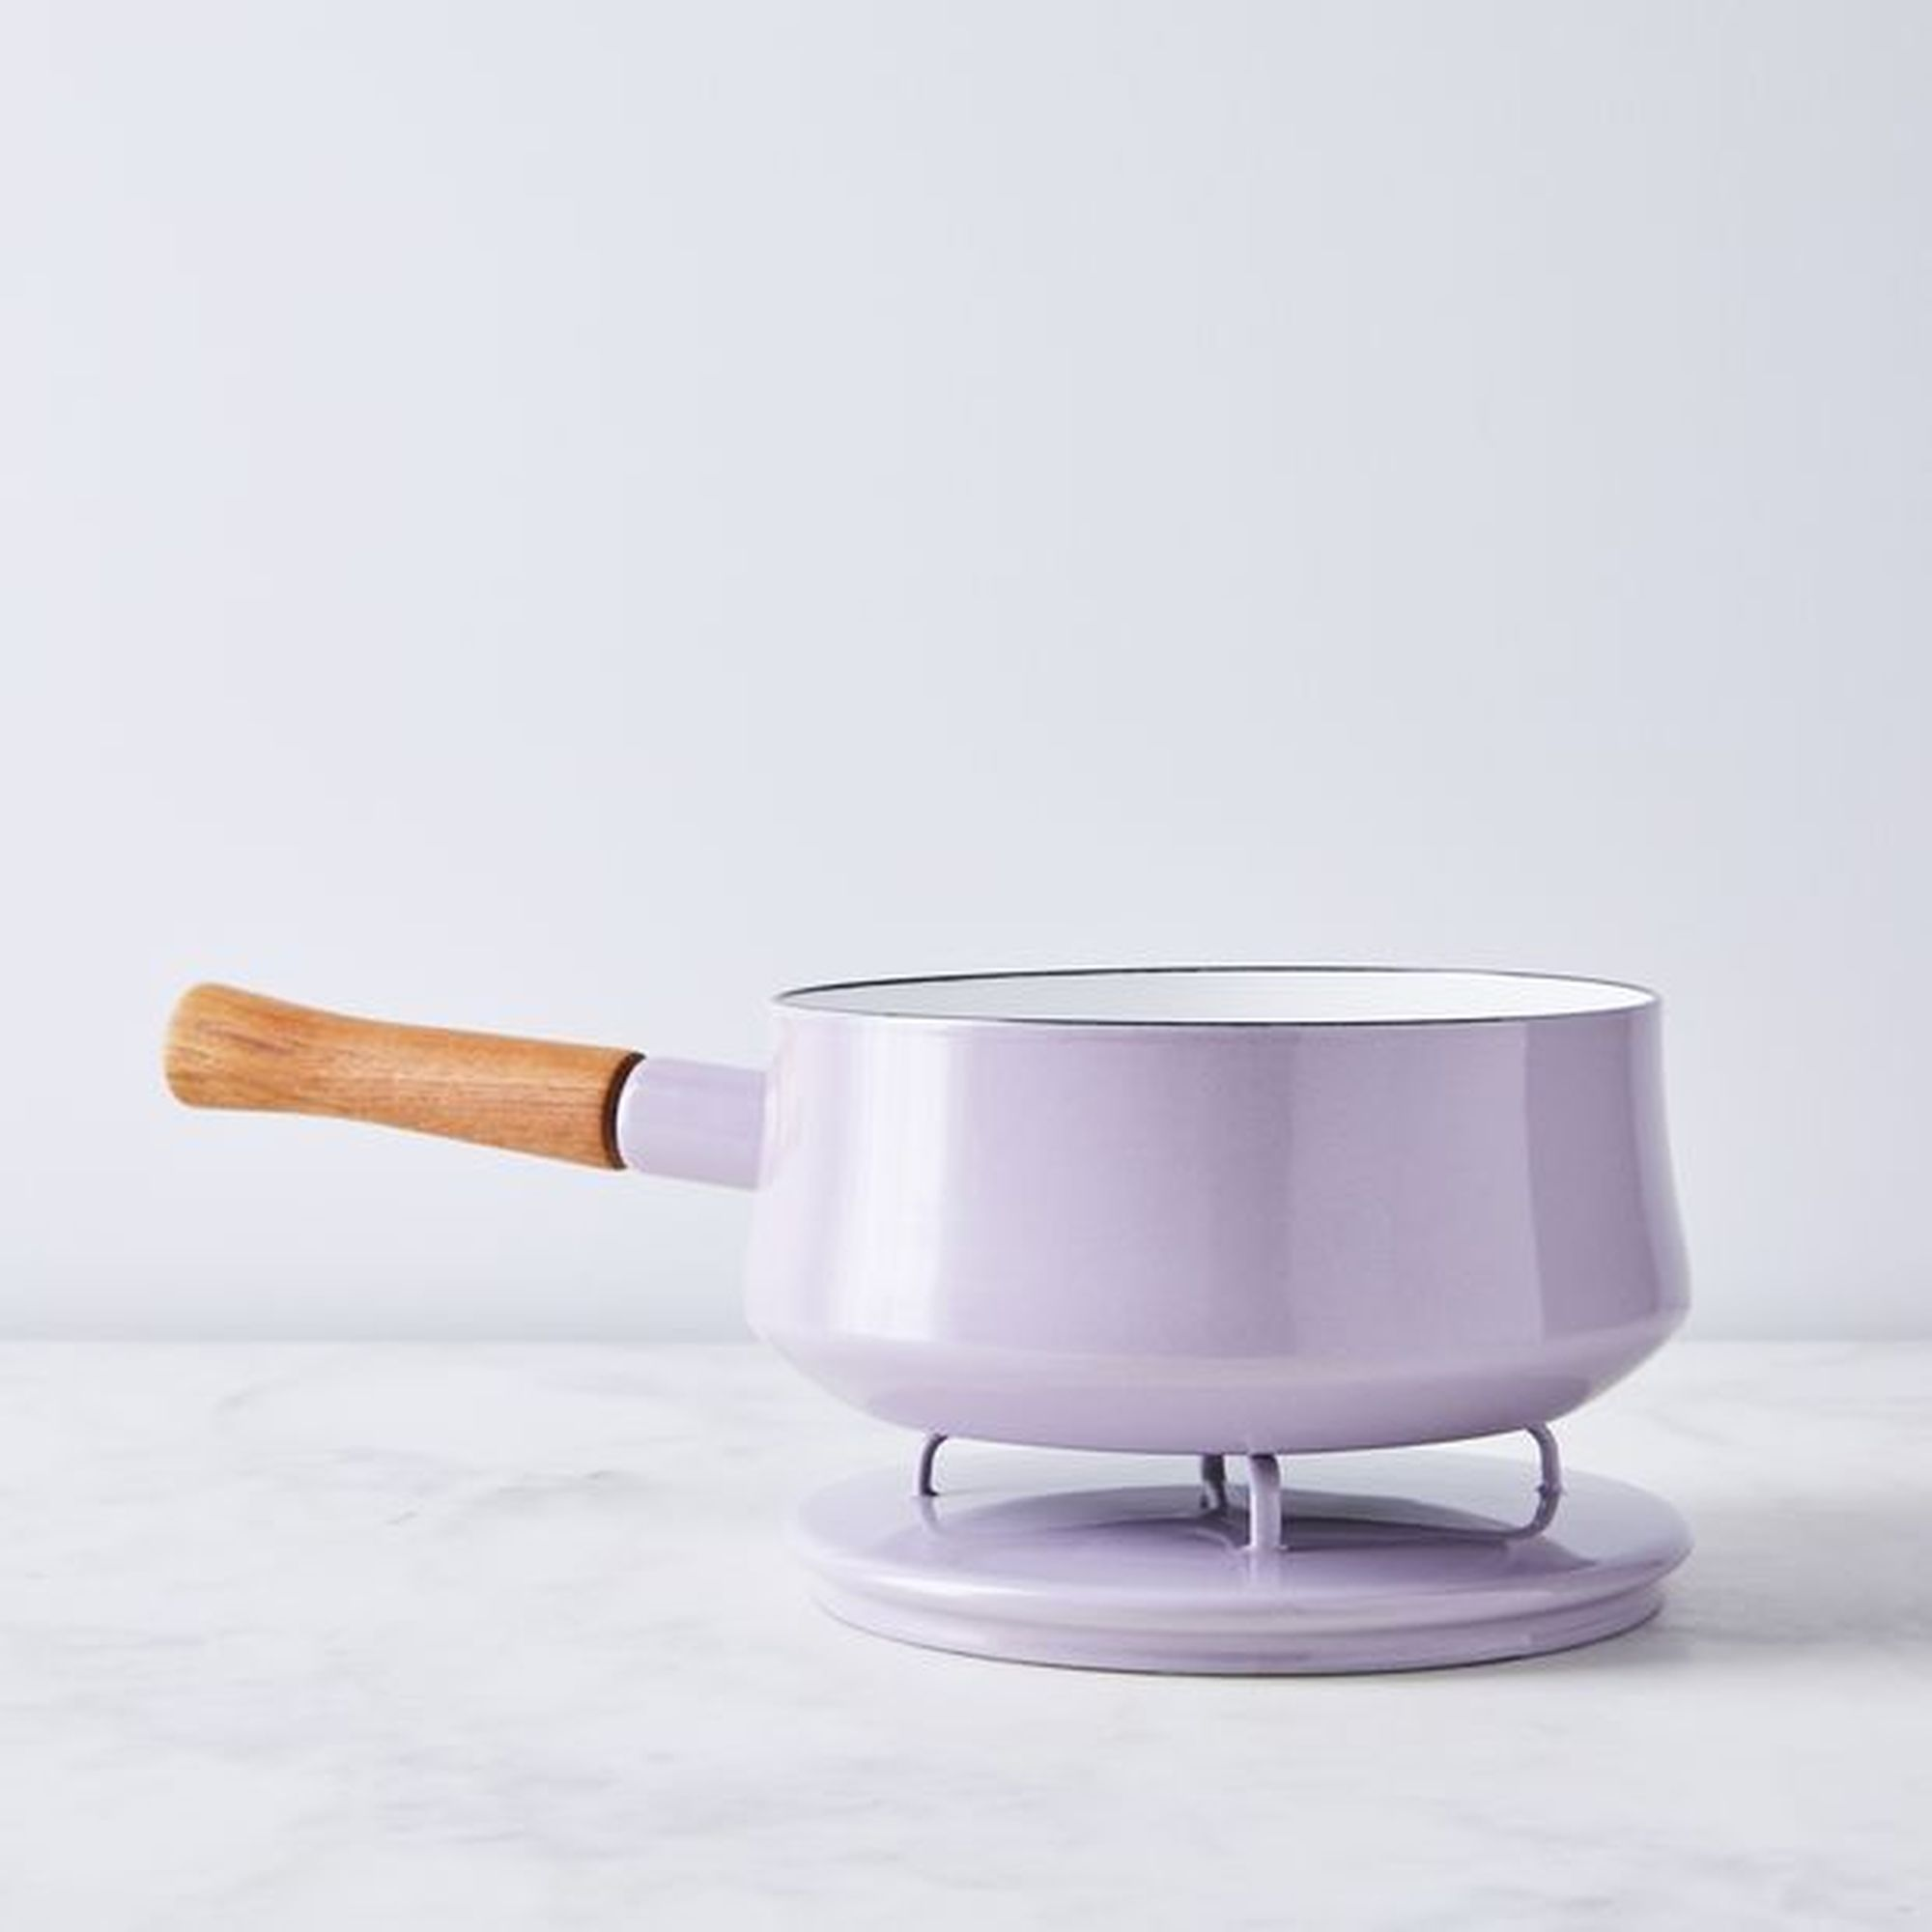 78e11a11-0b6a-463a-b8ed-85b3b335e32b--2019-0221_dansk_limited-edition_kobenstyle-pastels_lavender-2-quart-saucepan-with-lid_silo_ty-mecham_002_1-.jpg